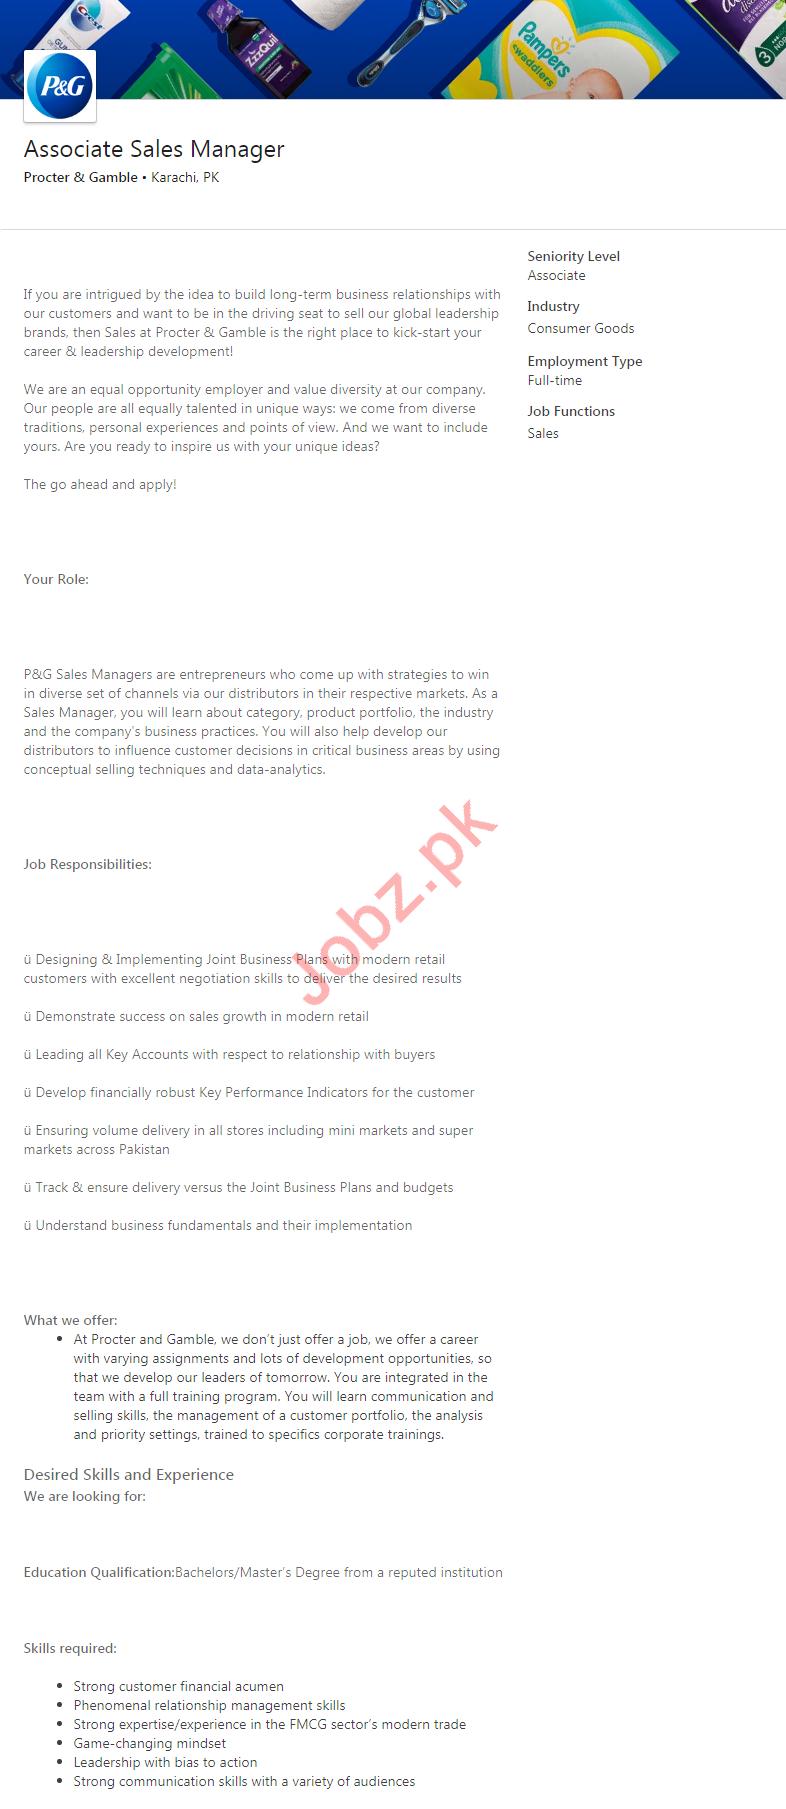 Associate Sales Manager Job 2020 in Karachi